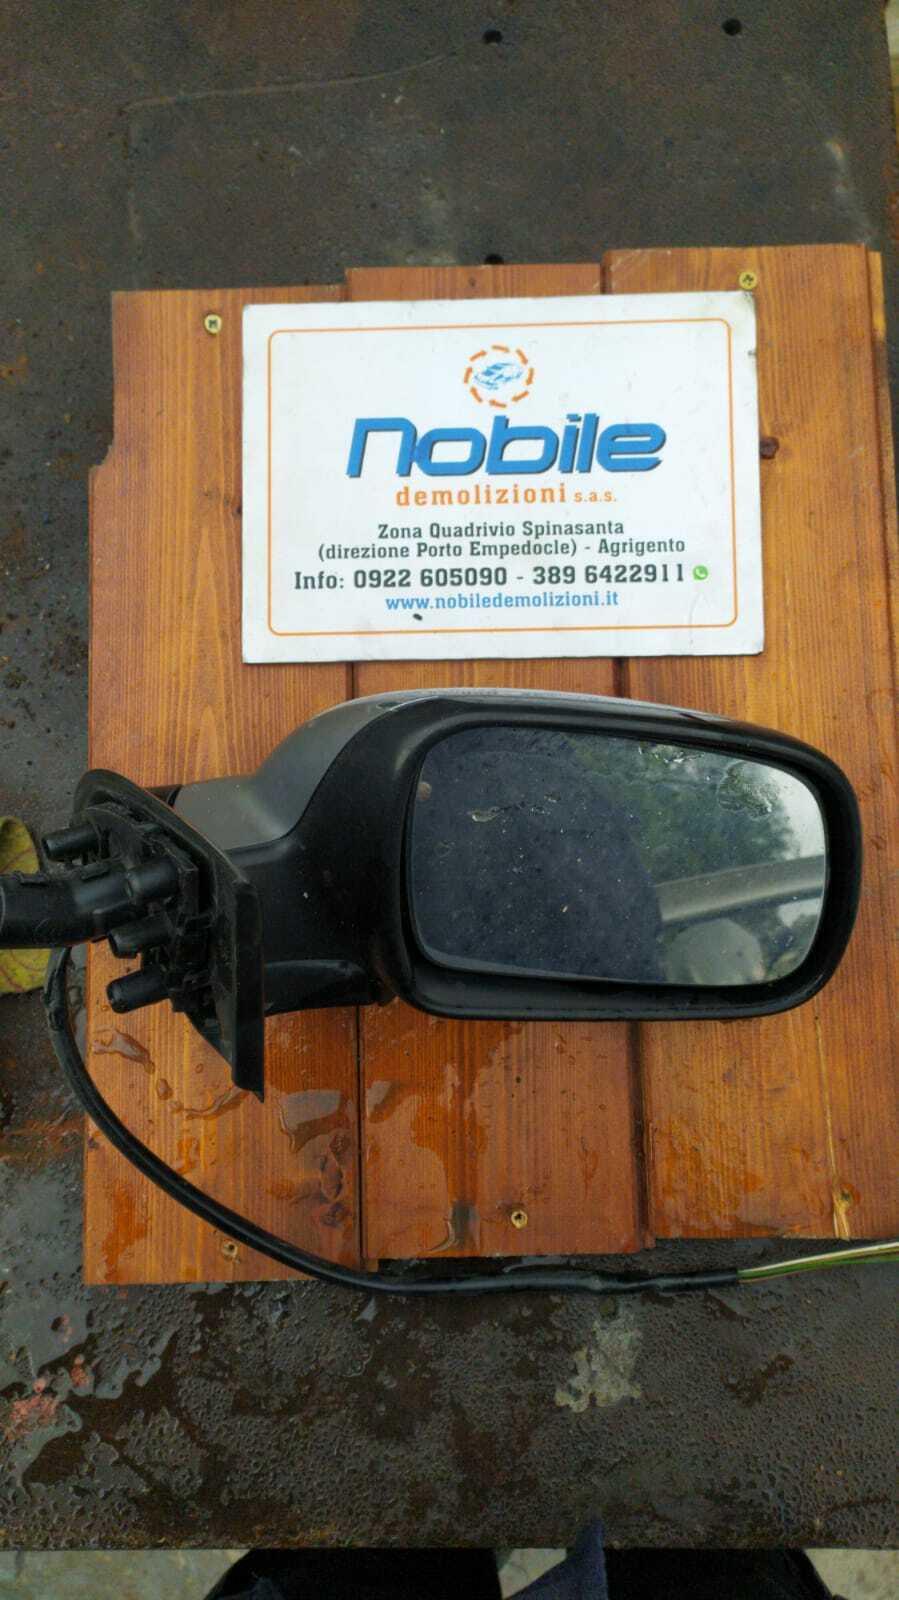 Specchio Retrovisore Peugeot 308 2013 Elett Destro Term